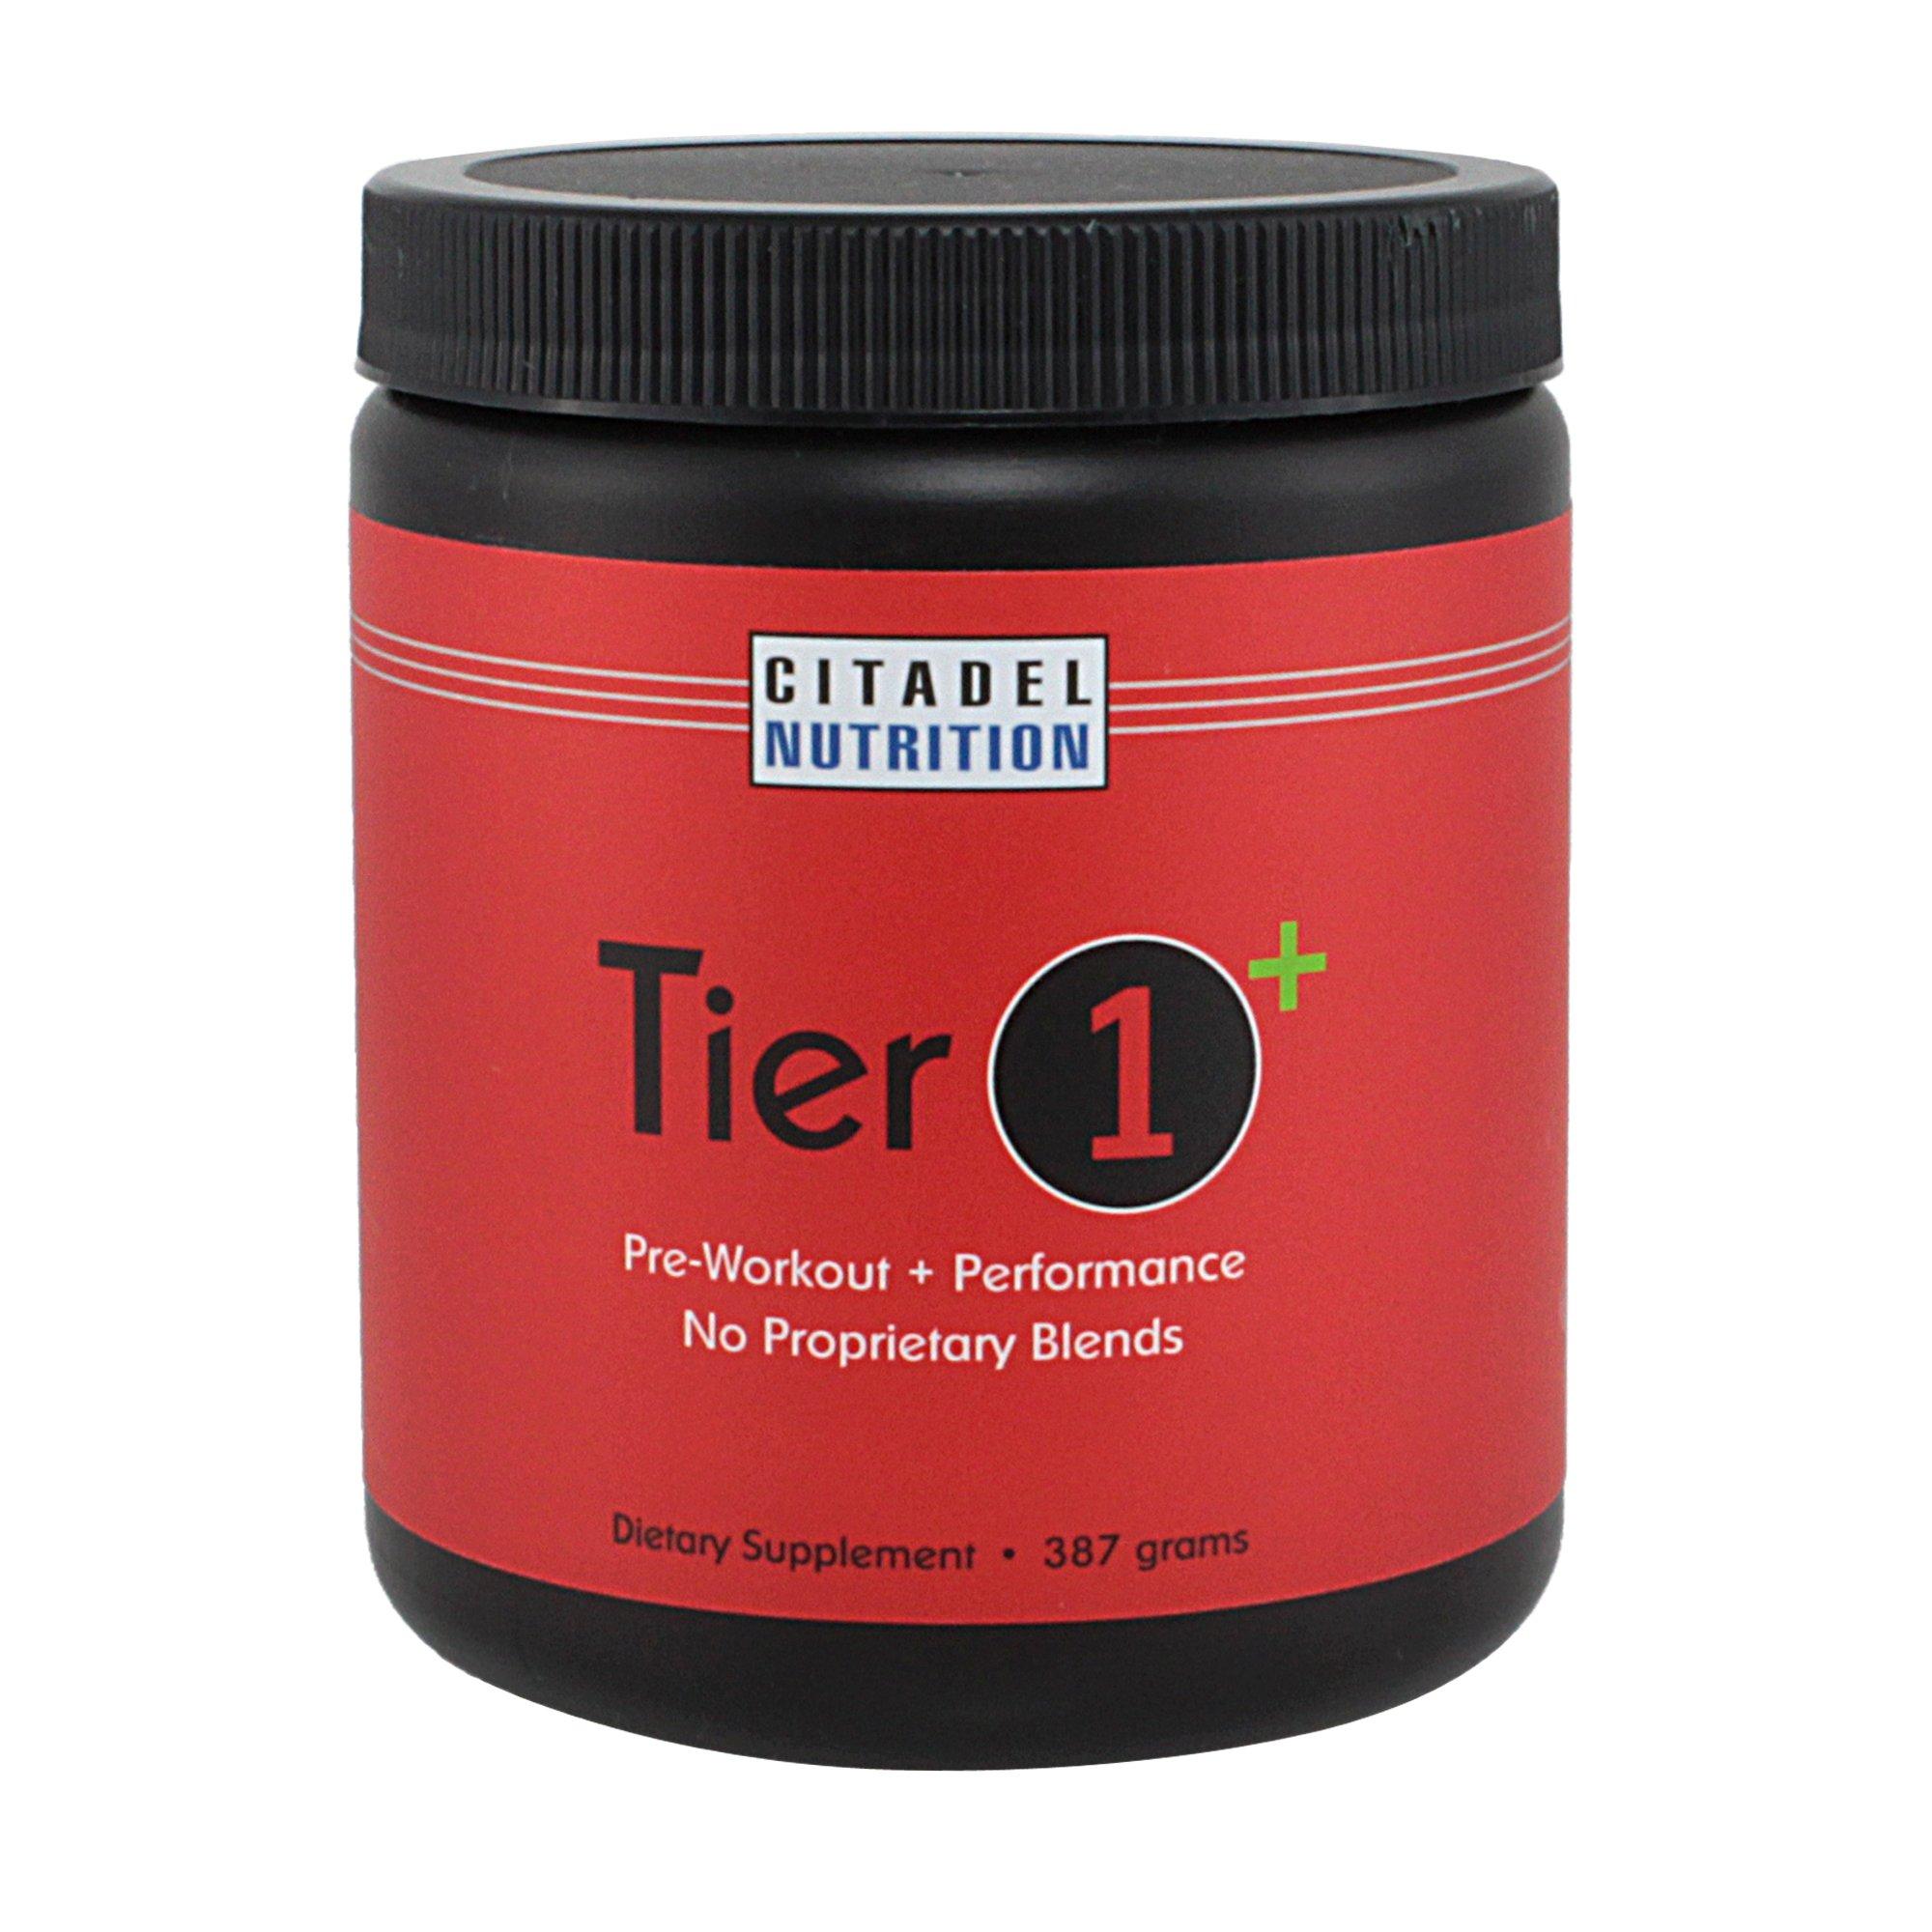 Tier 1 Plus Preworkout / Performance Supplement (387g) by Citadel Nutrition